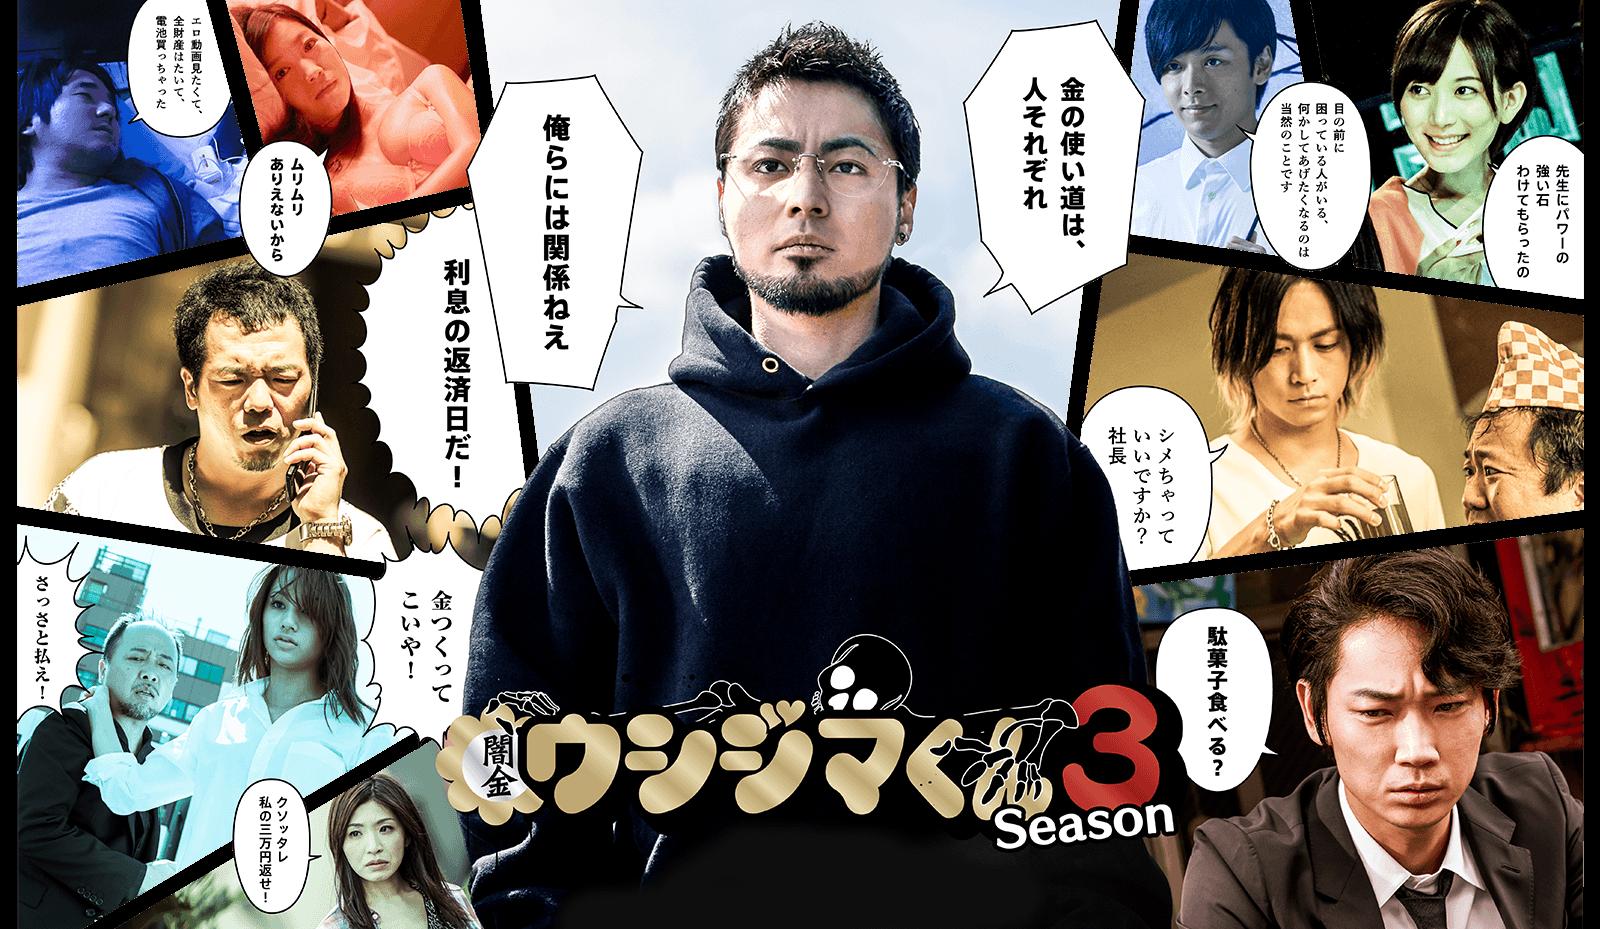 TV『闇金ウシジマくん Season 3』公式サイト